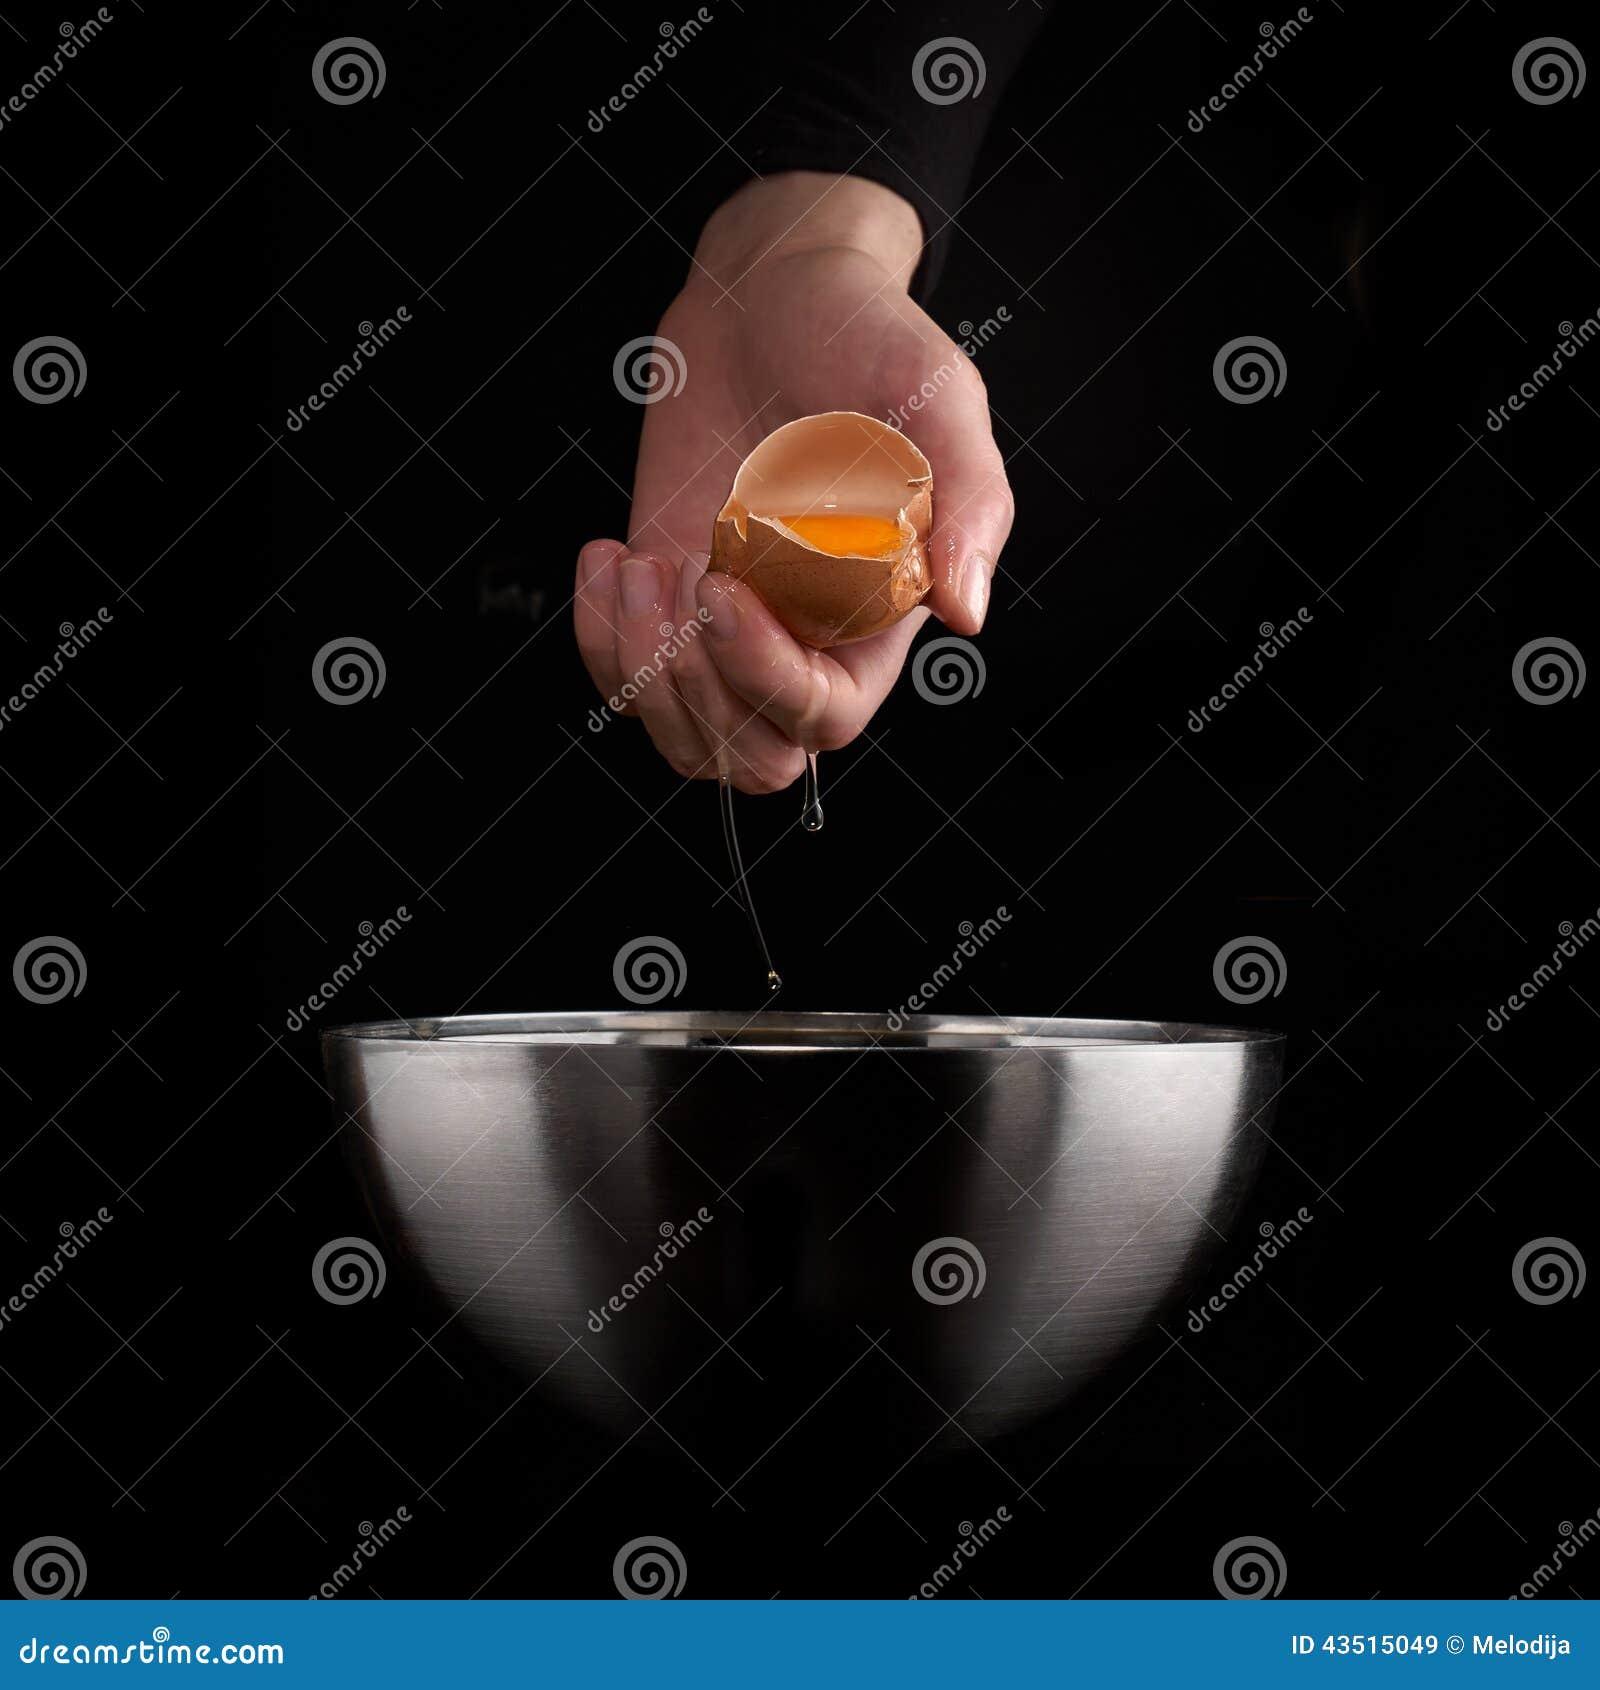 egg yolk falling - photo #24